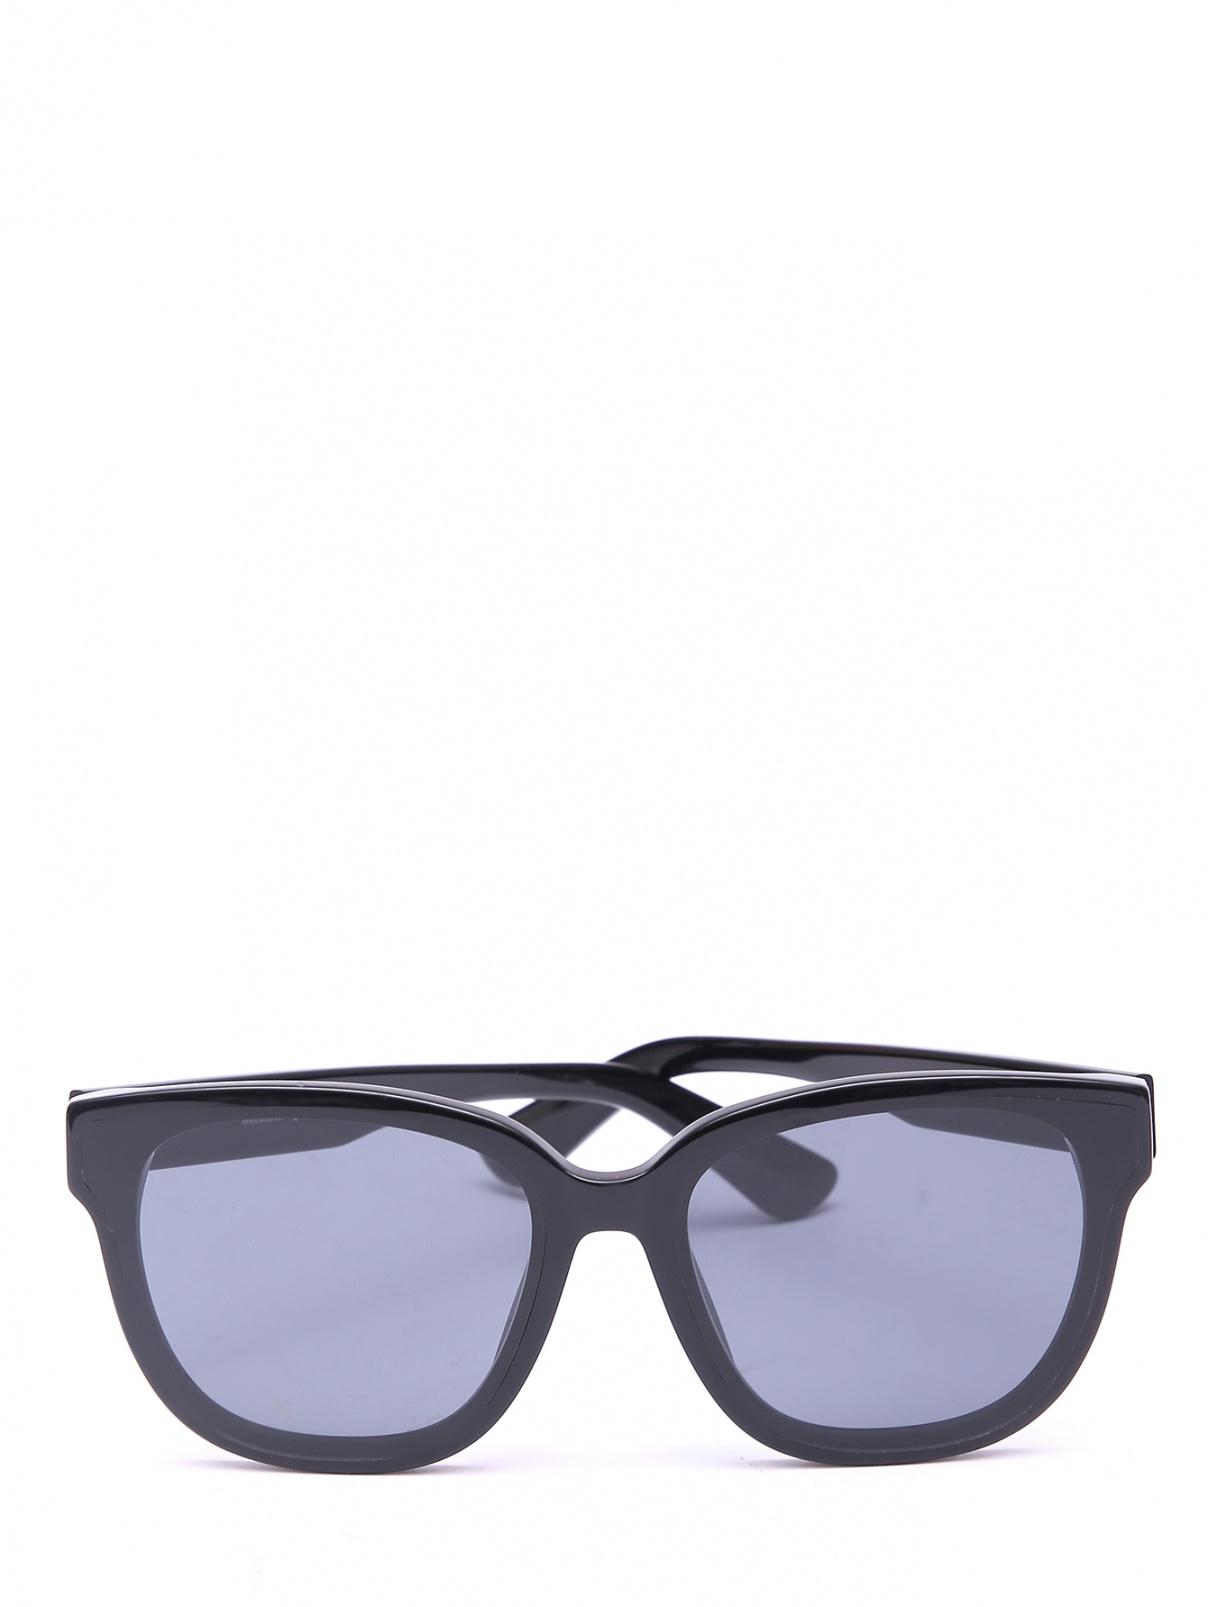 Солнцезащитные очки в оправе из пластика Moschino  –  Общий вид